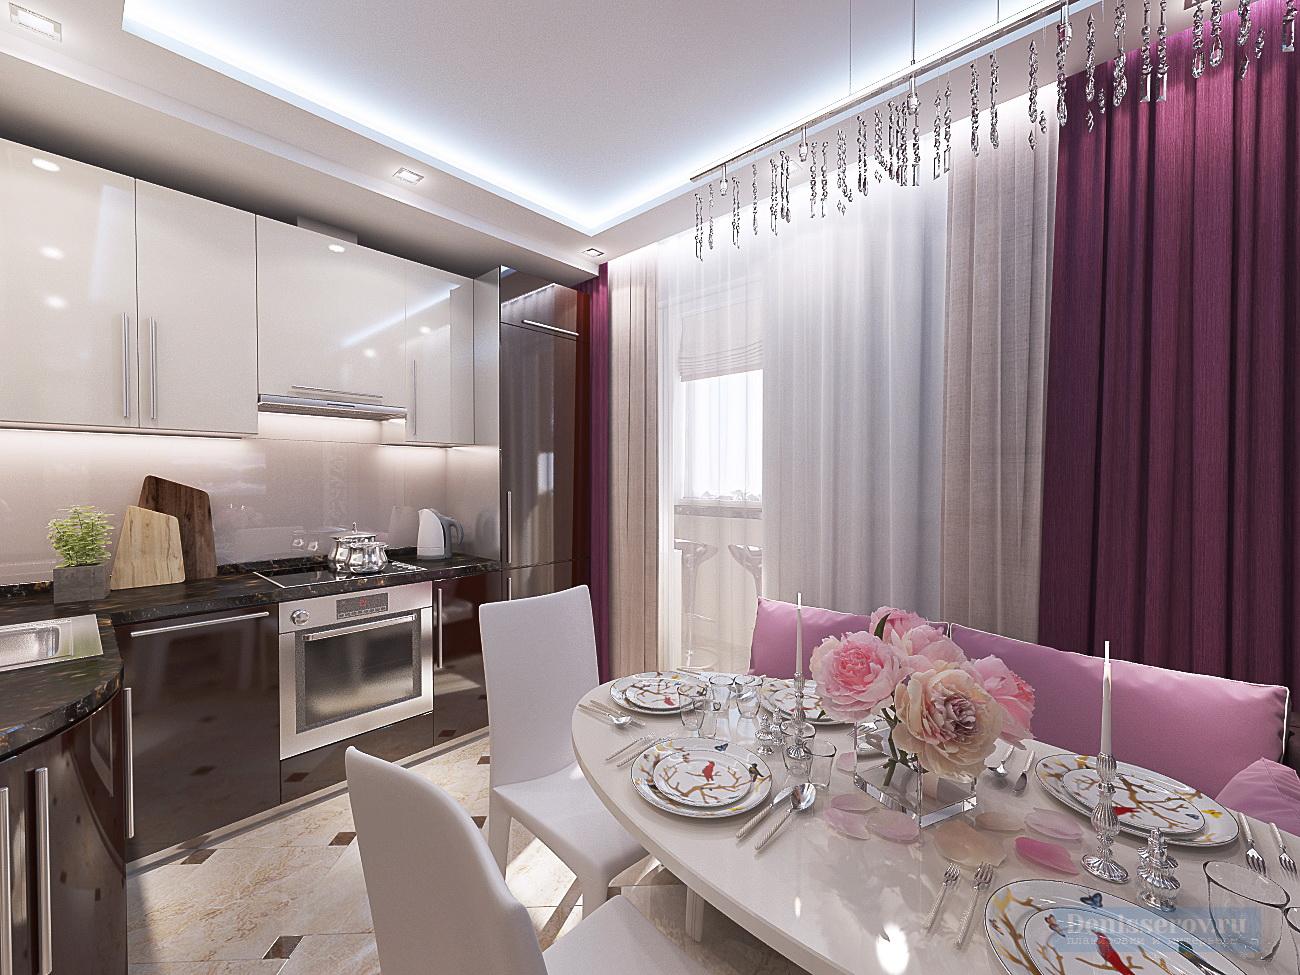 Дизайн проект кухни 9 кв.м.